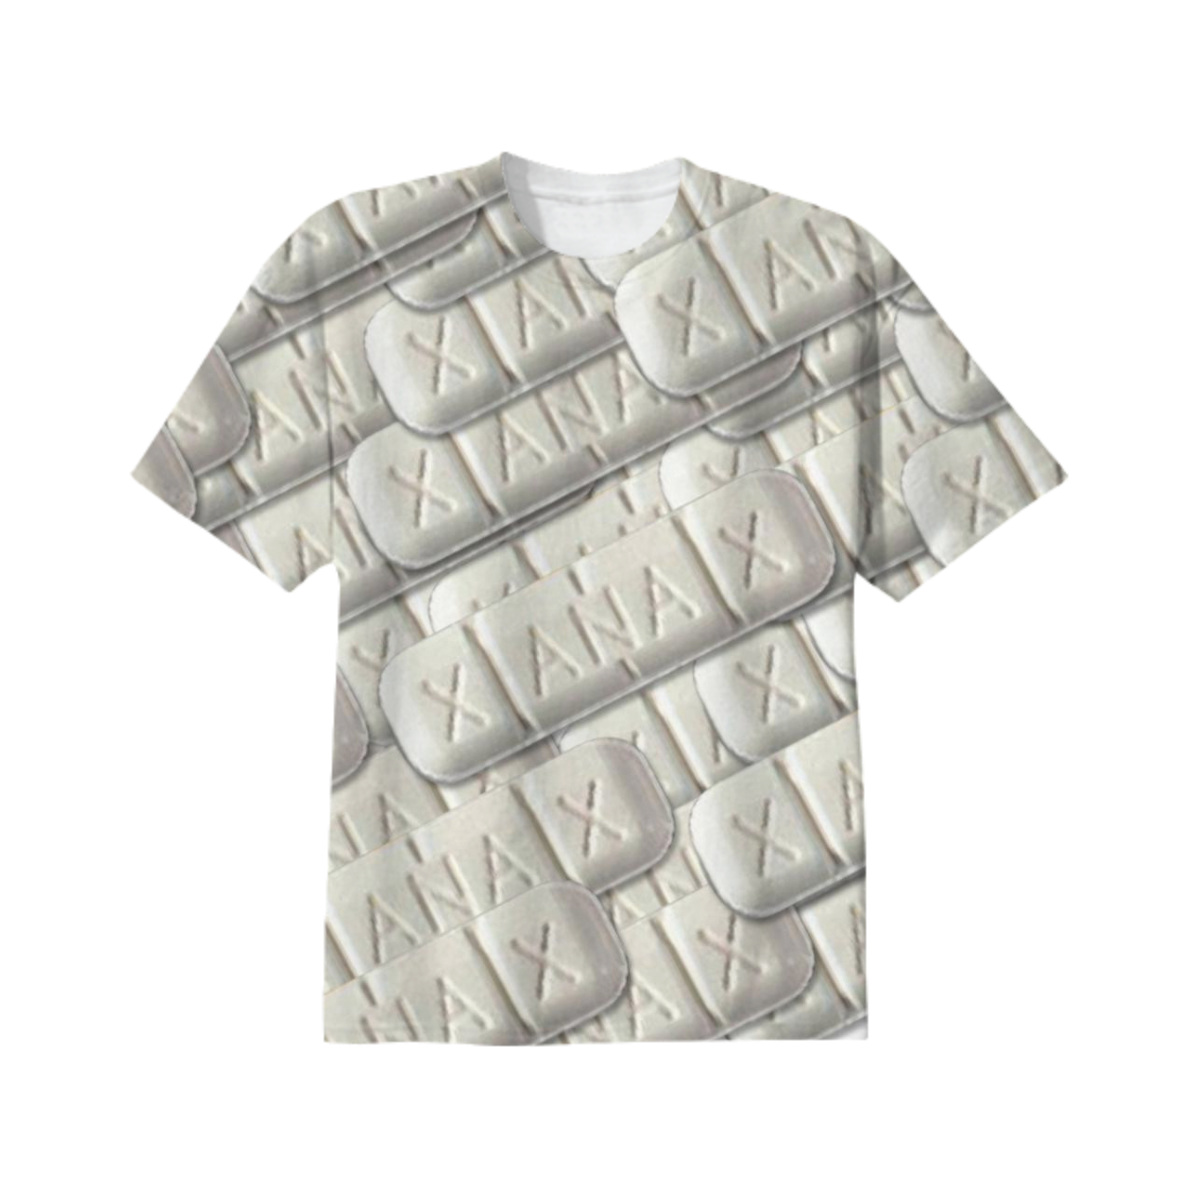 Xanax T Shirt Fashion Pinterest